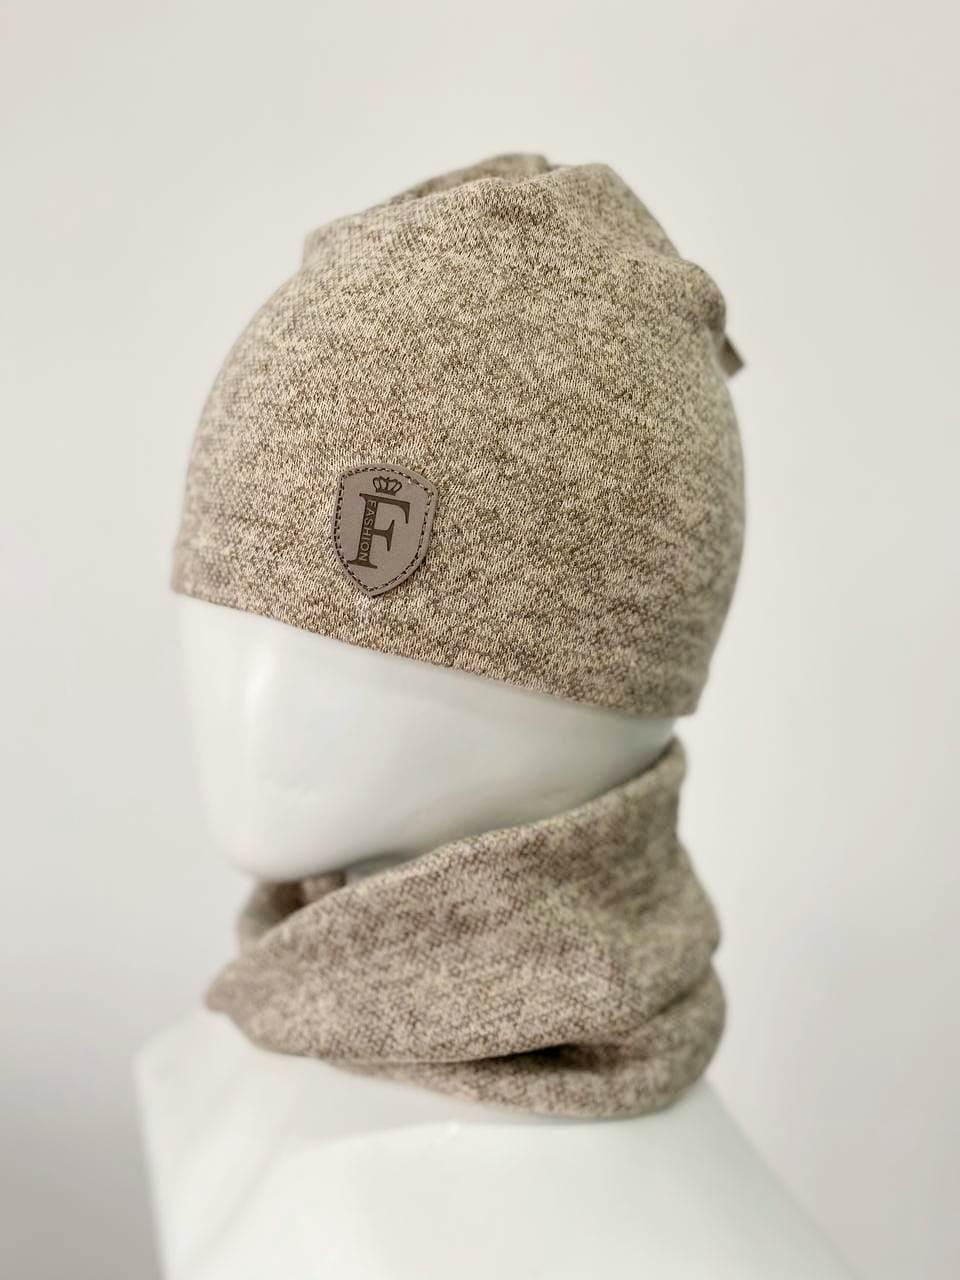 Трикотажний комплект(шапка+хомут)Ангора меланж беж